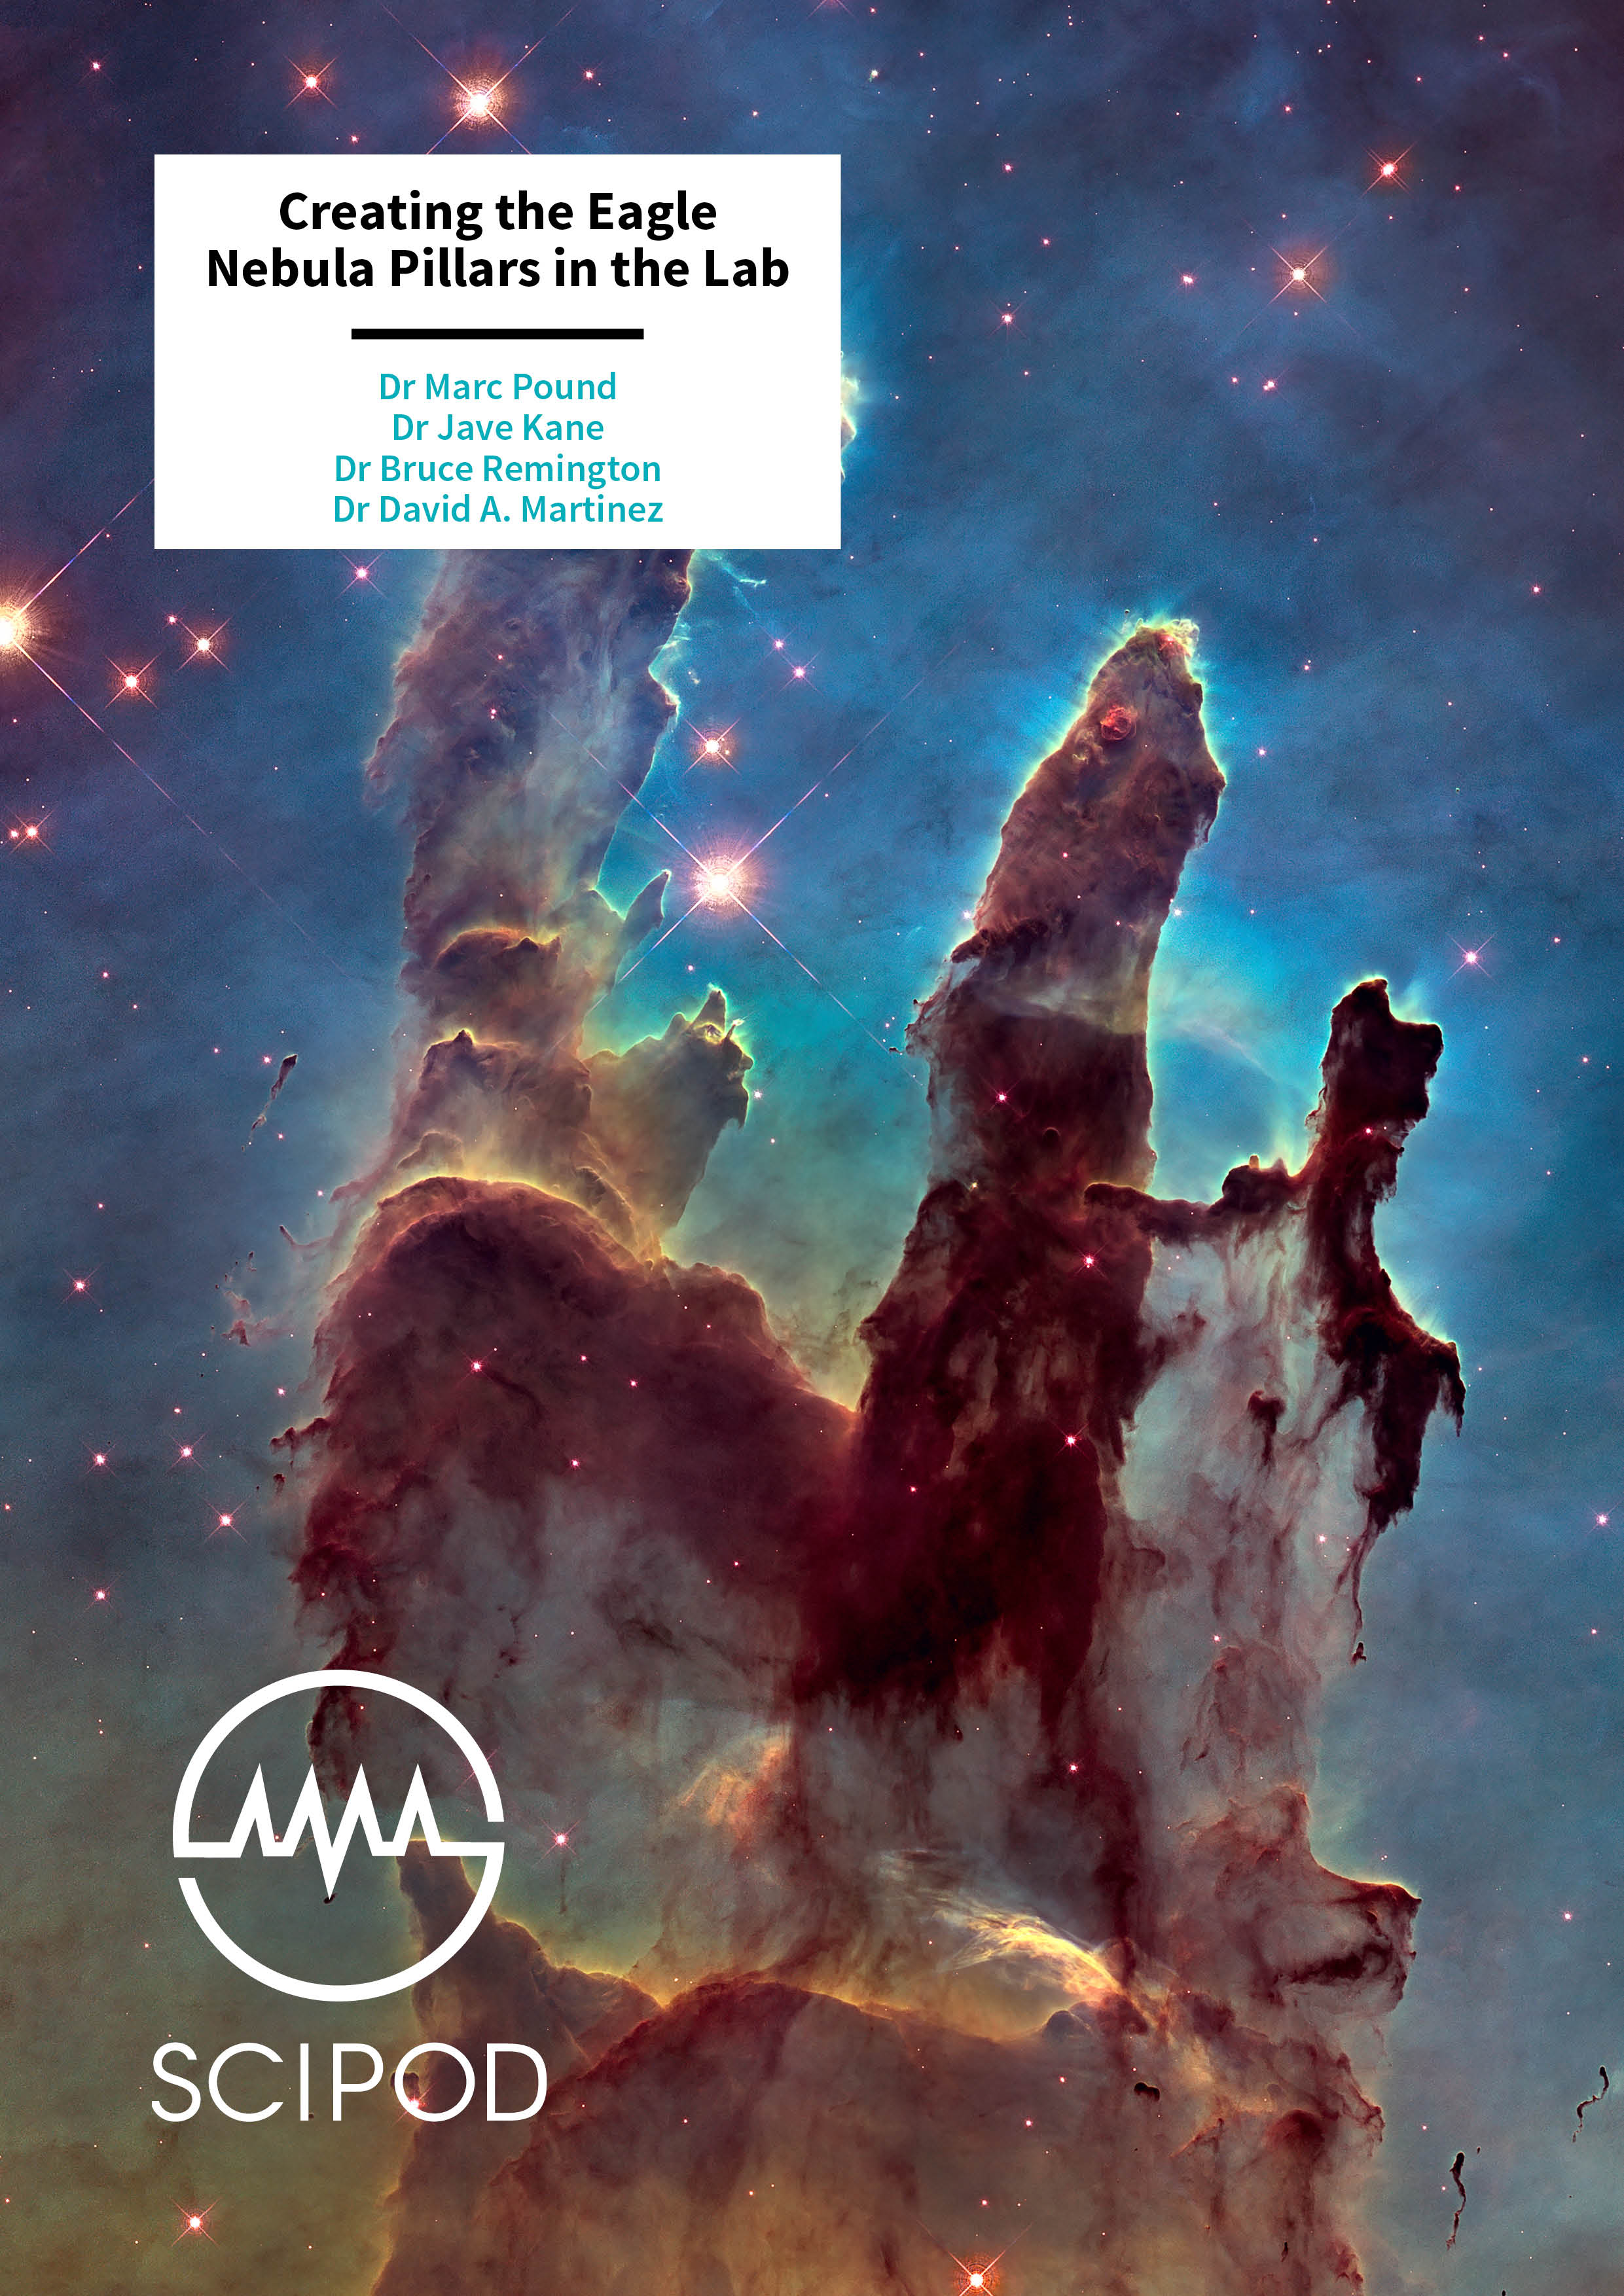 Creating the Eagle Nebula Pillars in the Lab – Drs Marc Pound, Jave Kane, Bruce Remington, David A. Martinez